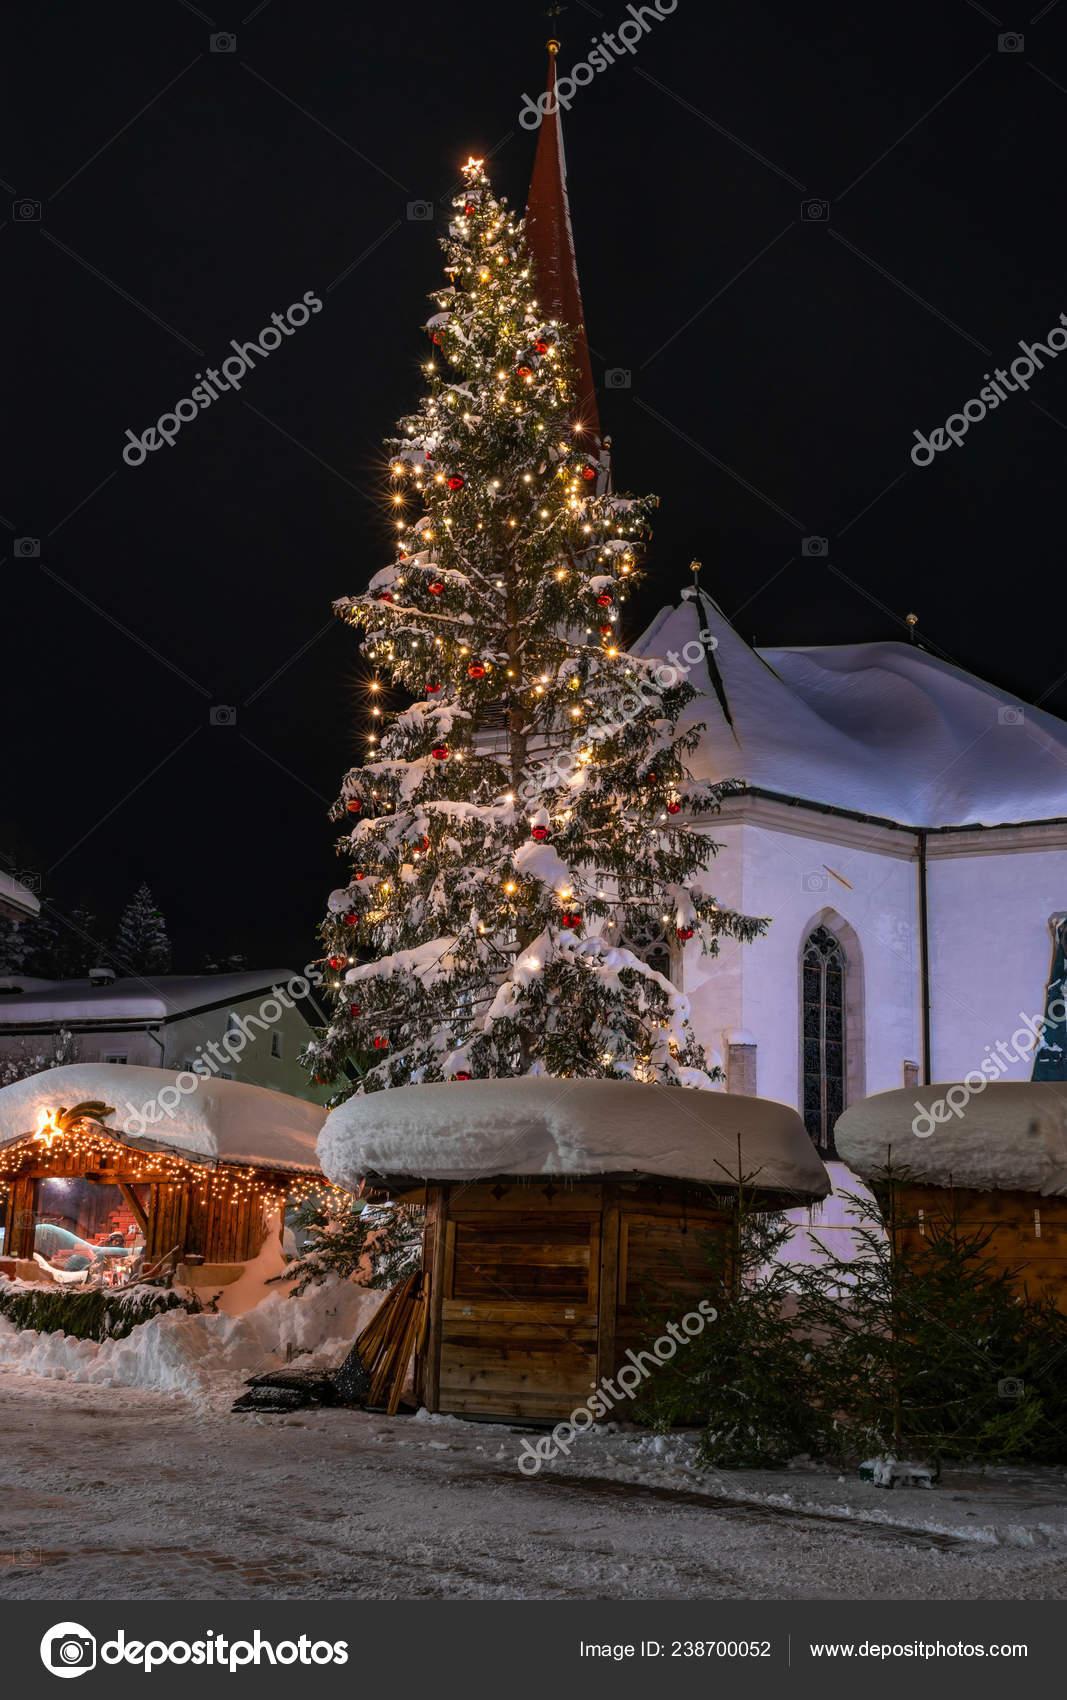 Christmas In Austria 2019.Seefeld Austria January 2019 Night View Oswald Parish Church